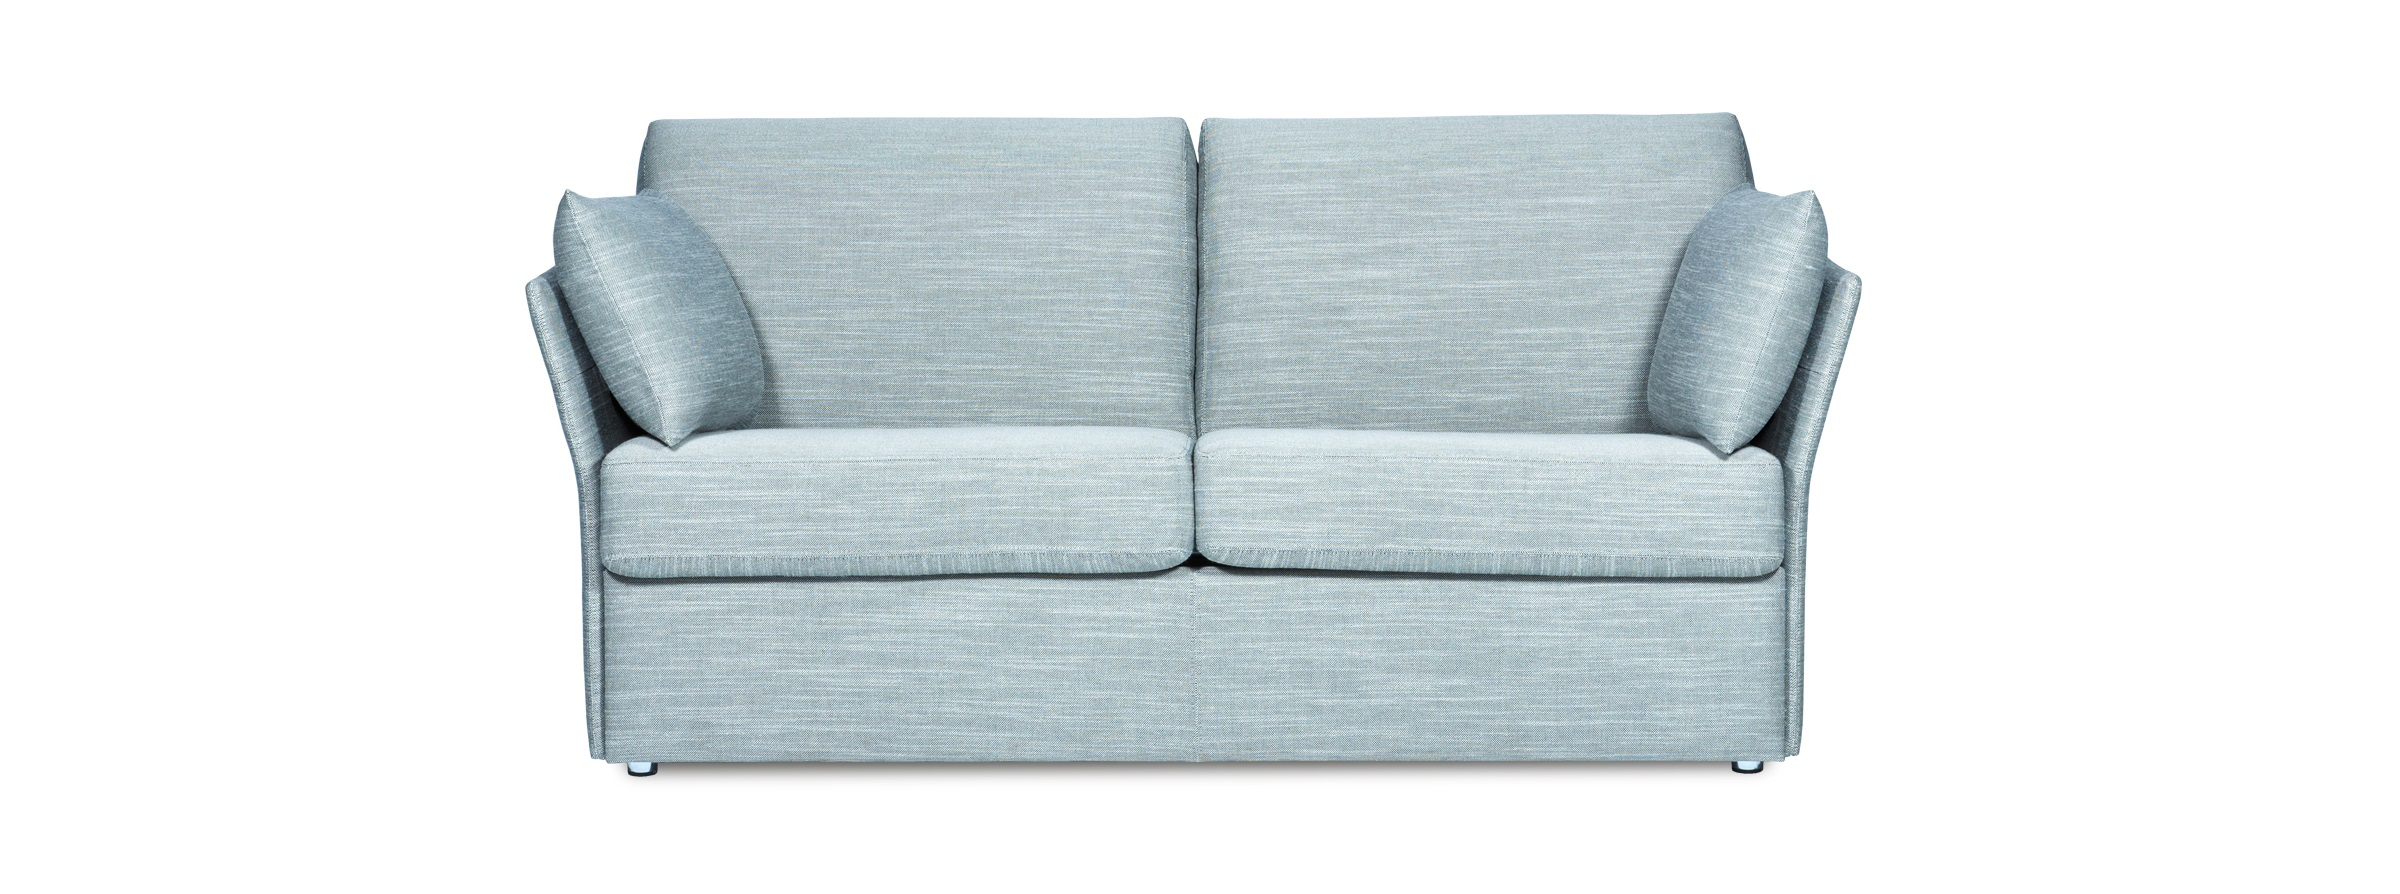 iris s neology. Black Bedroom Furniture Sets. Home Design Ideas